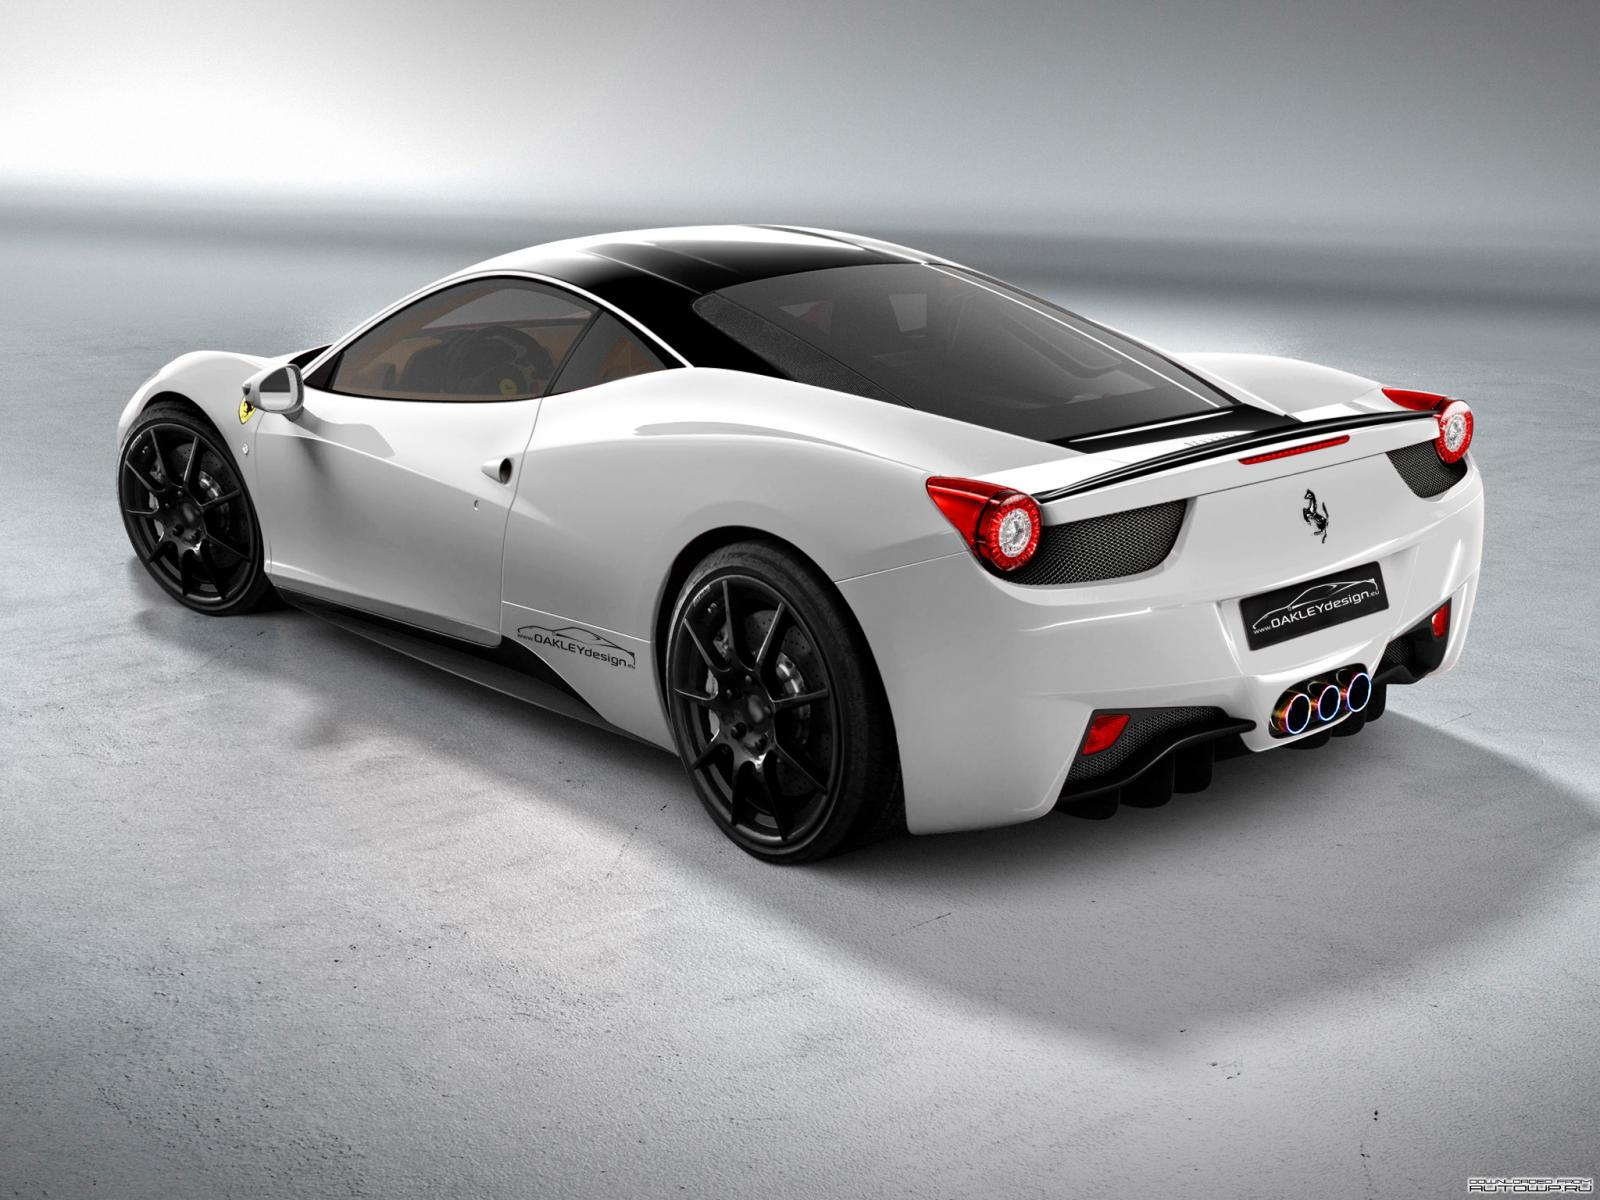 New 2012 cars ferrari 458 italia white ferrari 458 italia picture vanachro Image collections